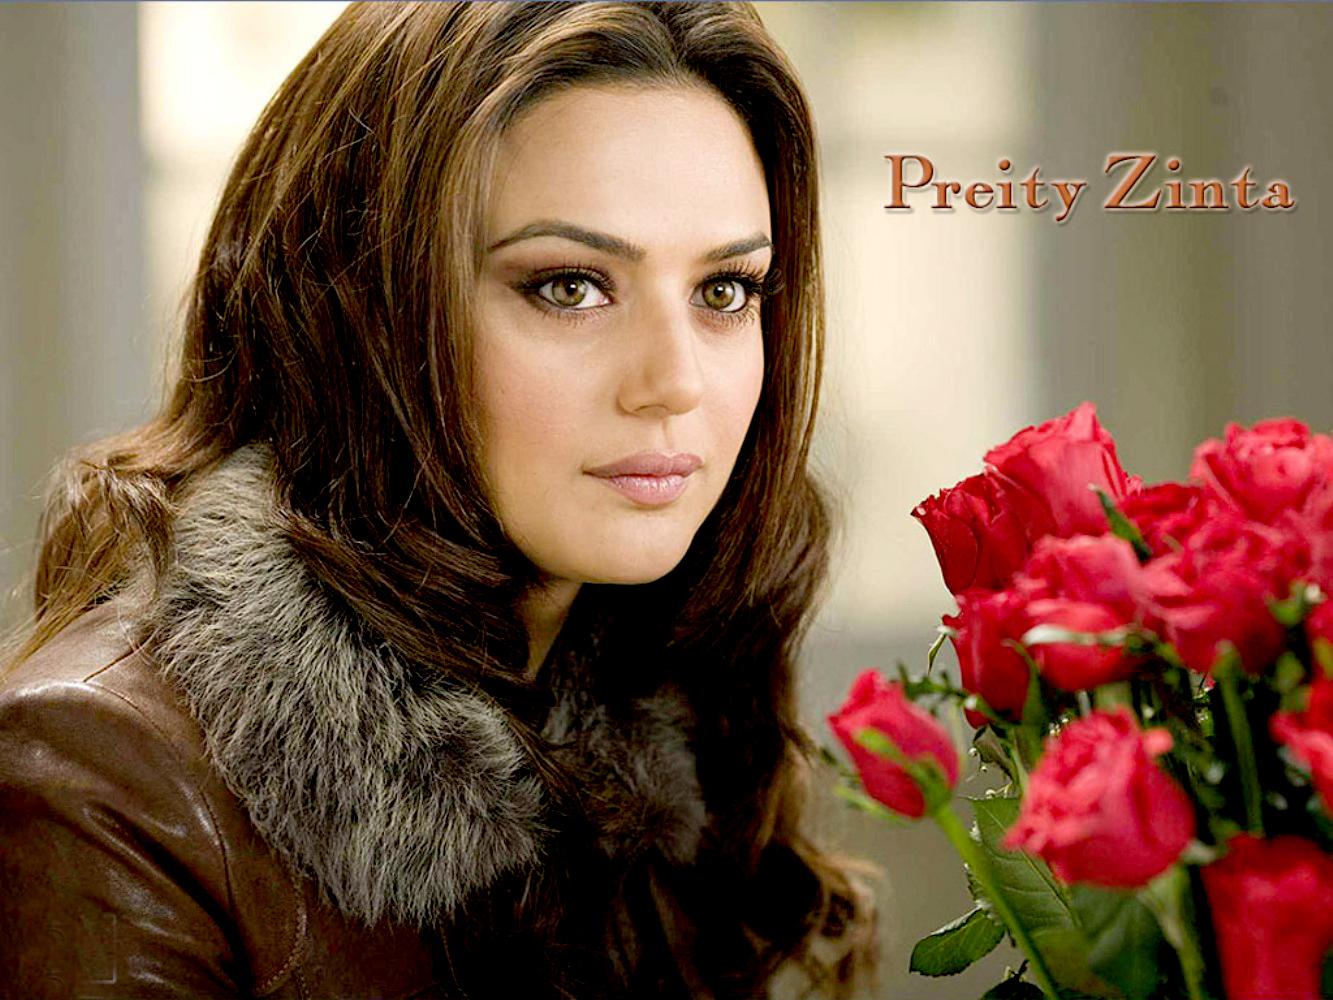 FamousCelebrityBible | Preity Zinta